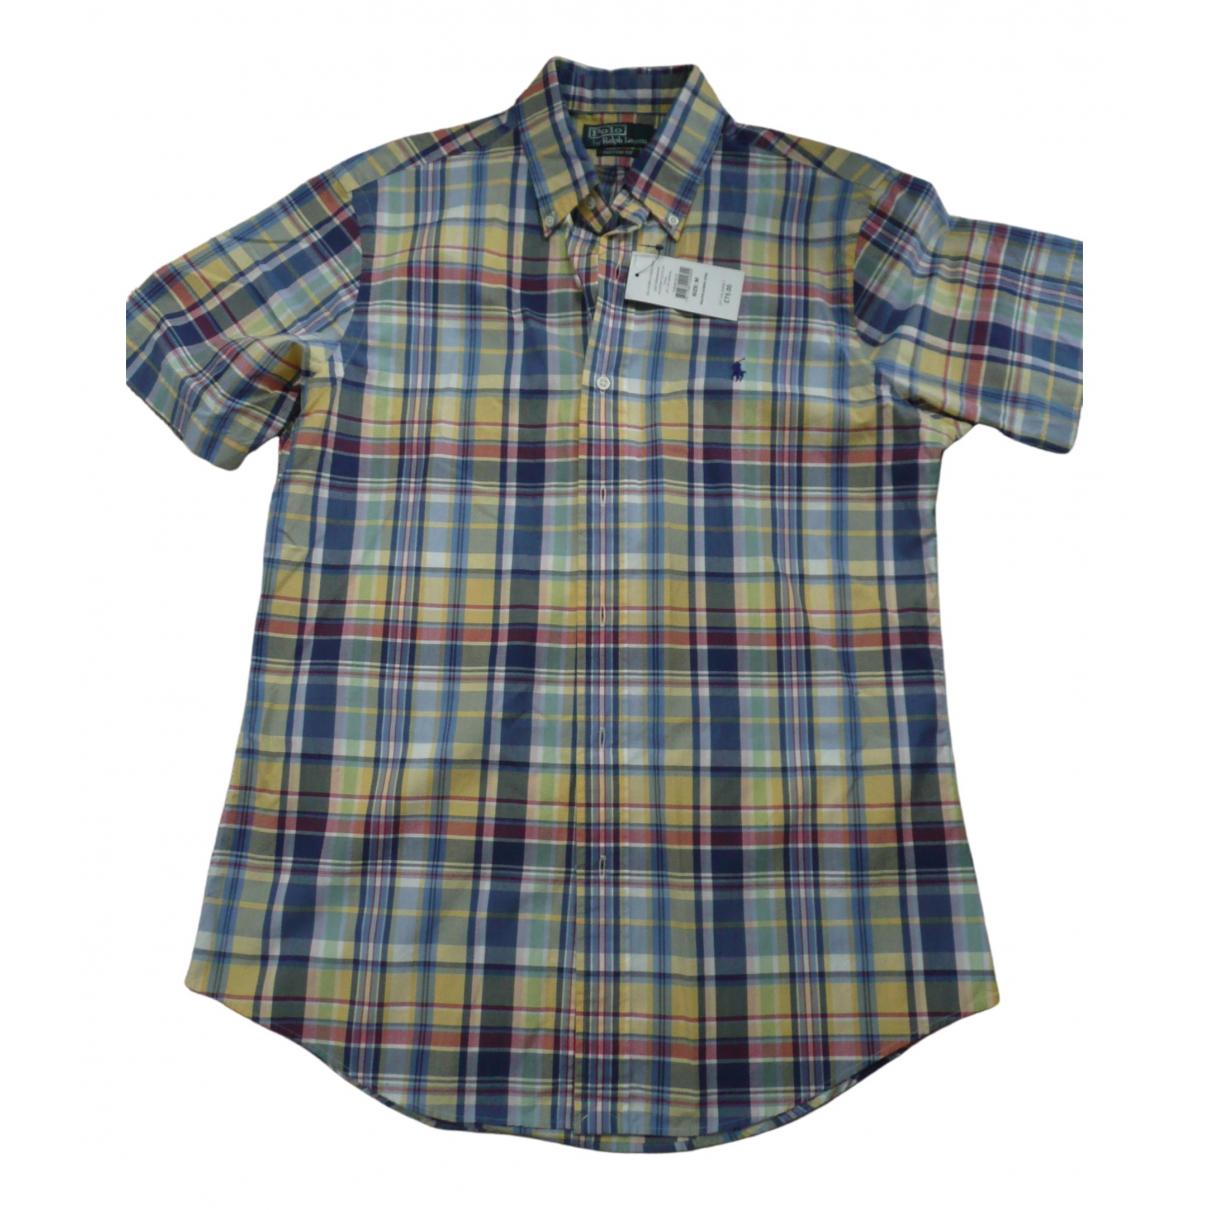 Polo Ralph Lauren \N Multicolour Cotton Shirts for Men M International